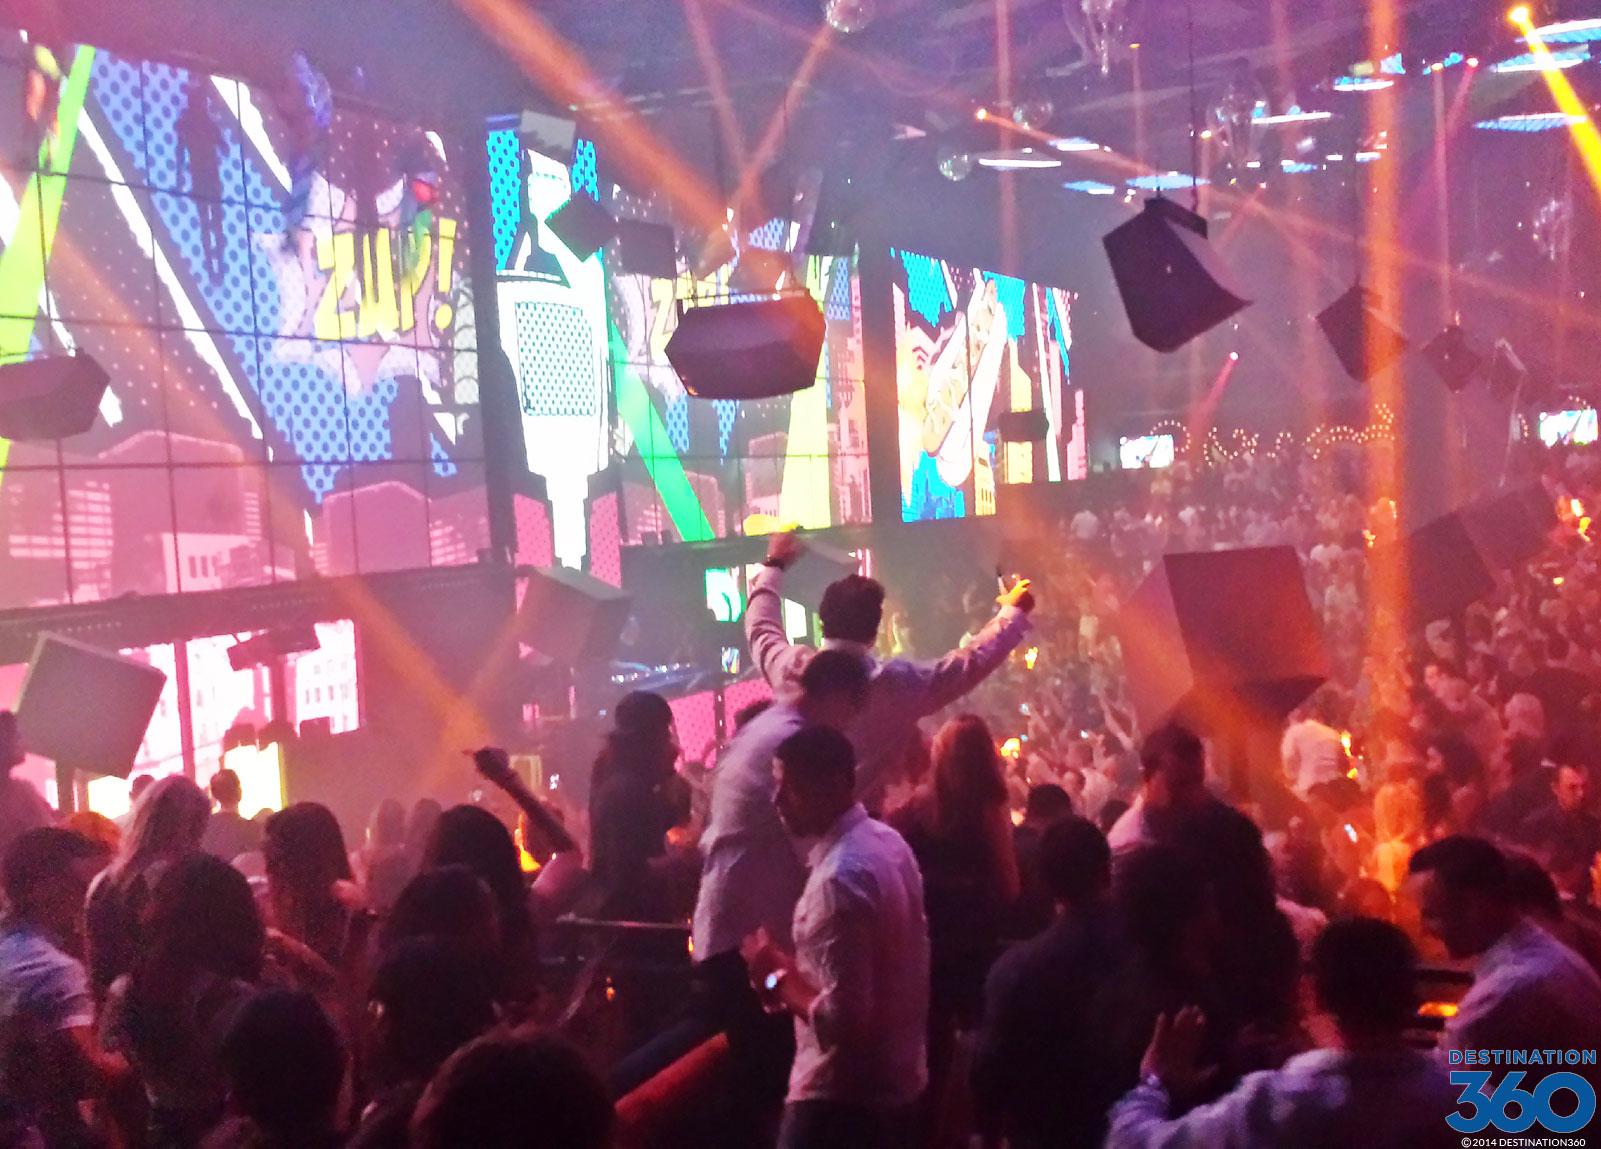 Light Las Vegas Mandalay Bay Nightclub Cirque du Soleil Club